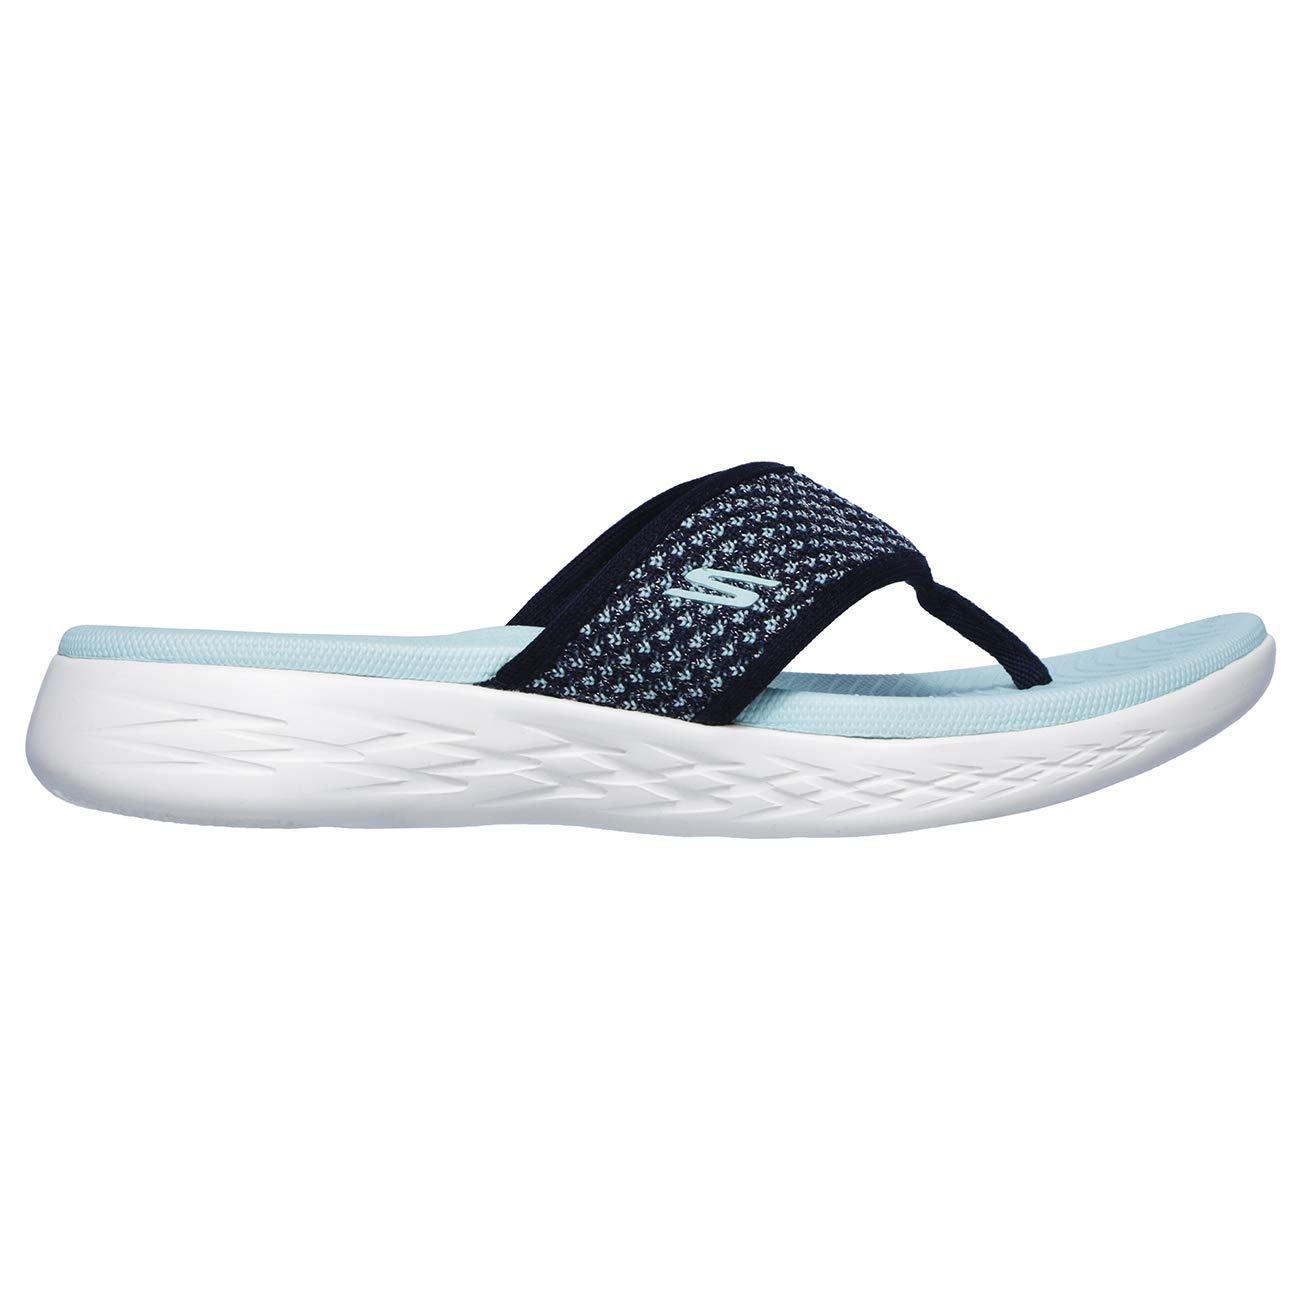 6896b60d5e4b Skechers On The Go 600 Womens Toe Post Sandals  Amazon.co.uk  Shoes   Bags